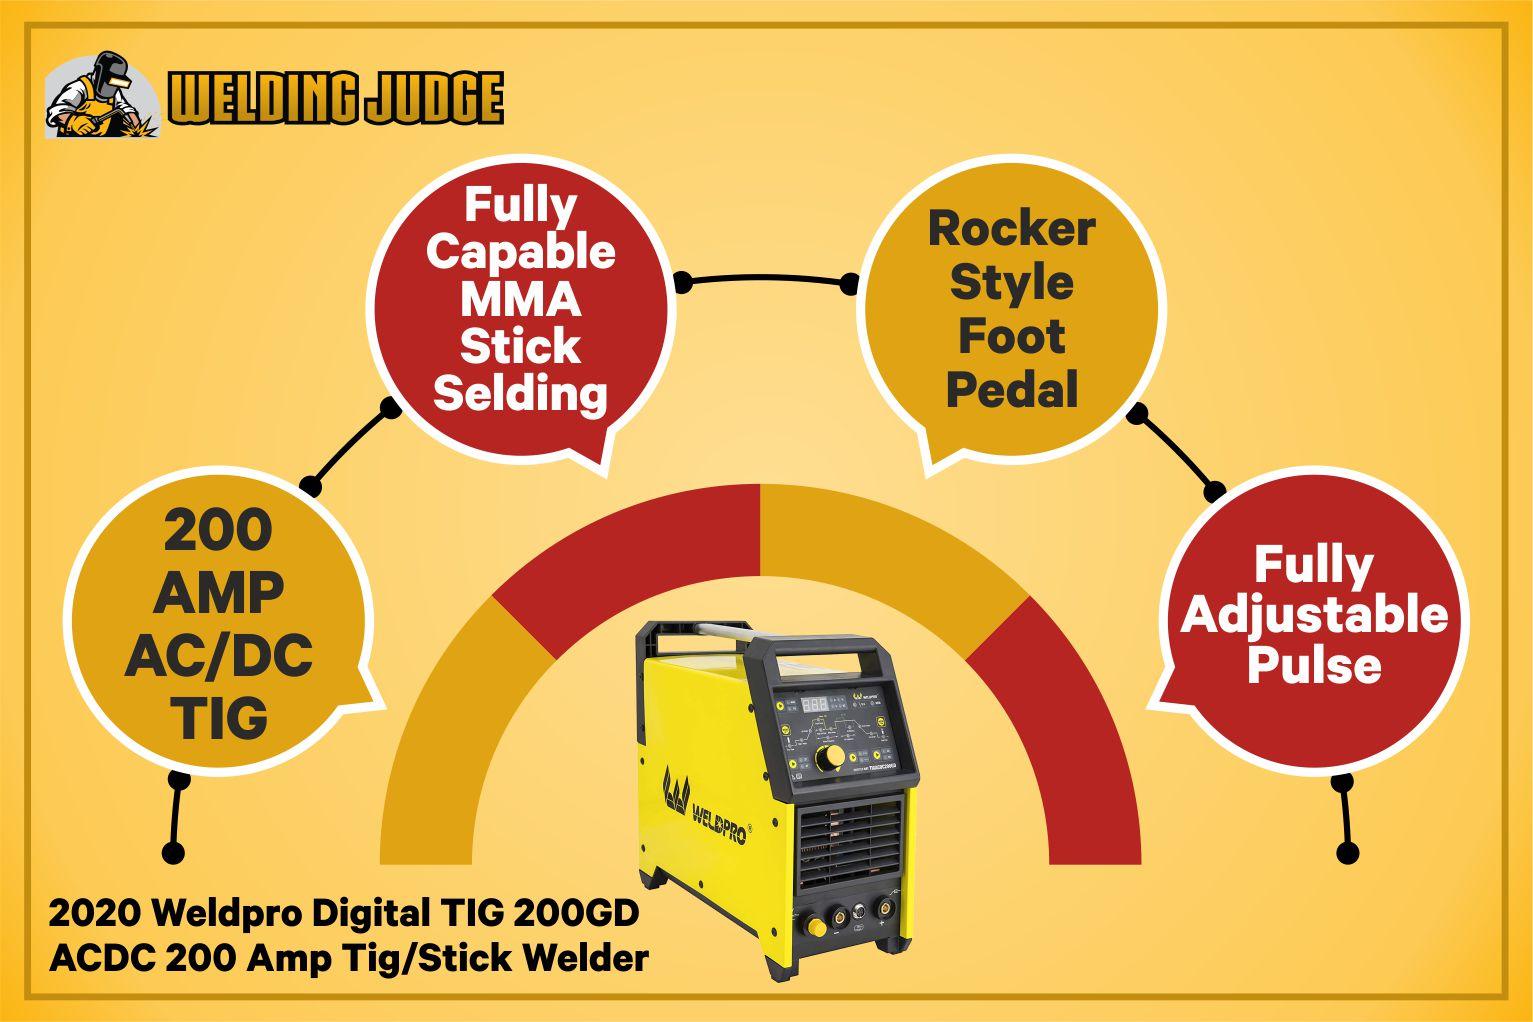 2020 Weldpro Digital - Best TIG Welder for Beginners infographic detail